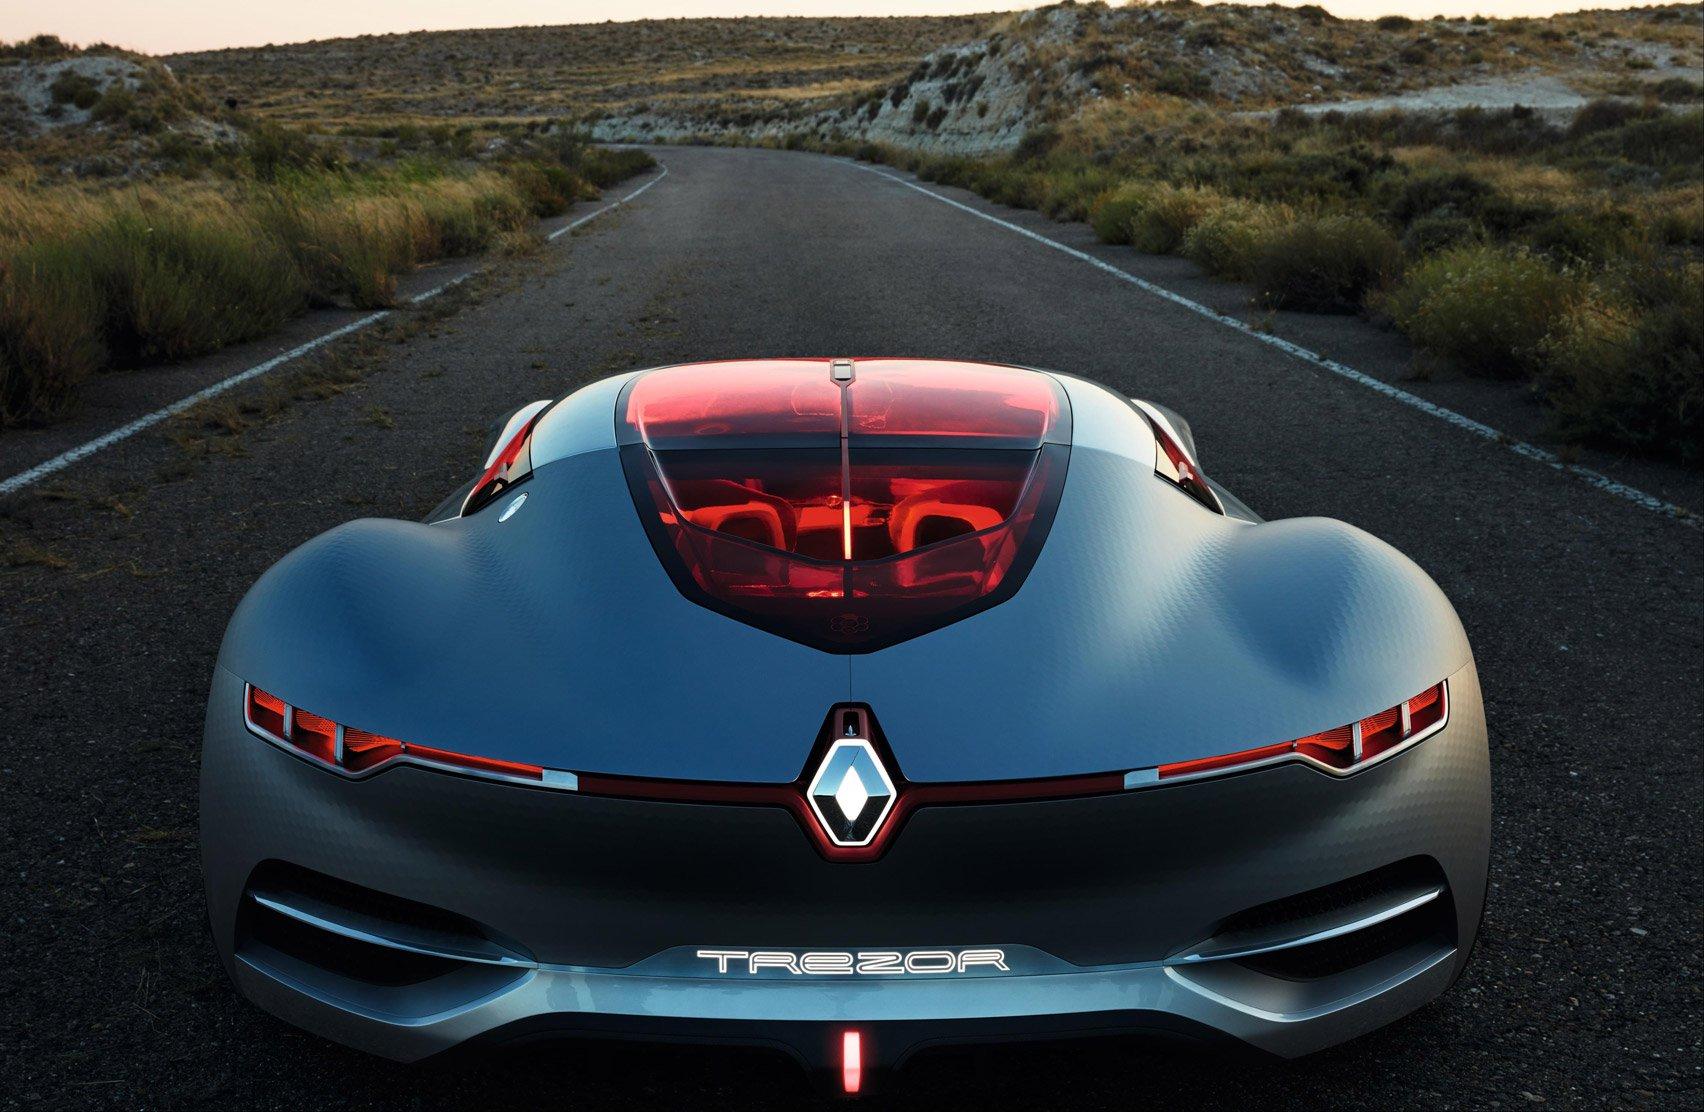 renault-trezor-concept-car-paris-motor-show_dezeen_1704_col_1